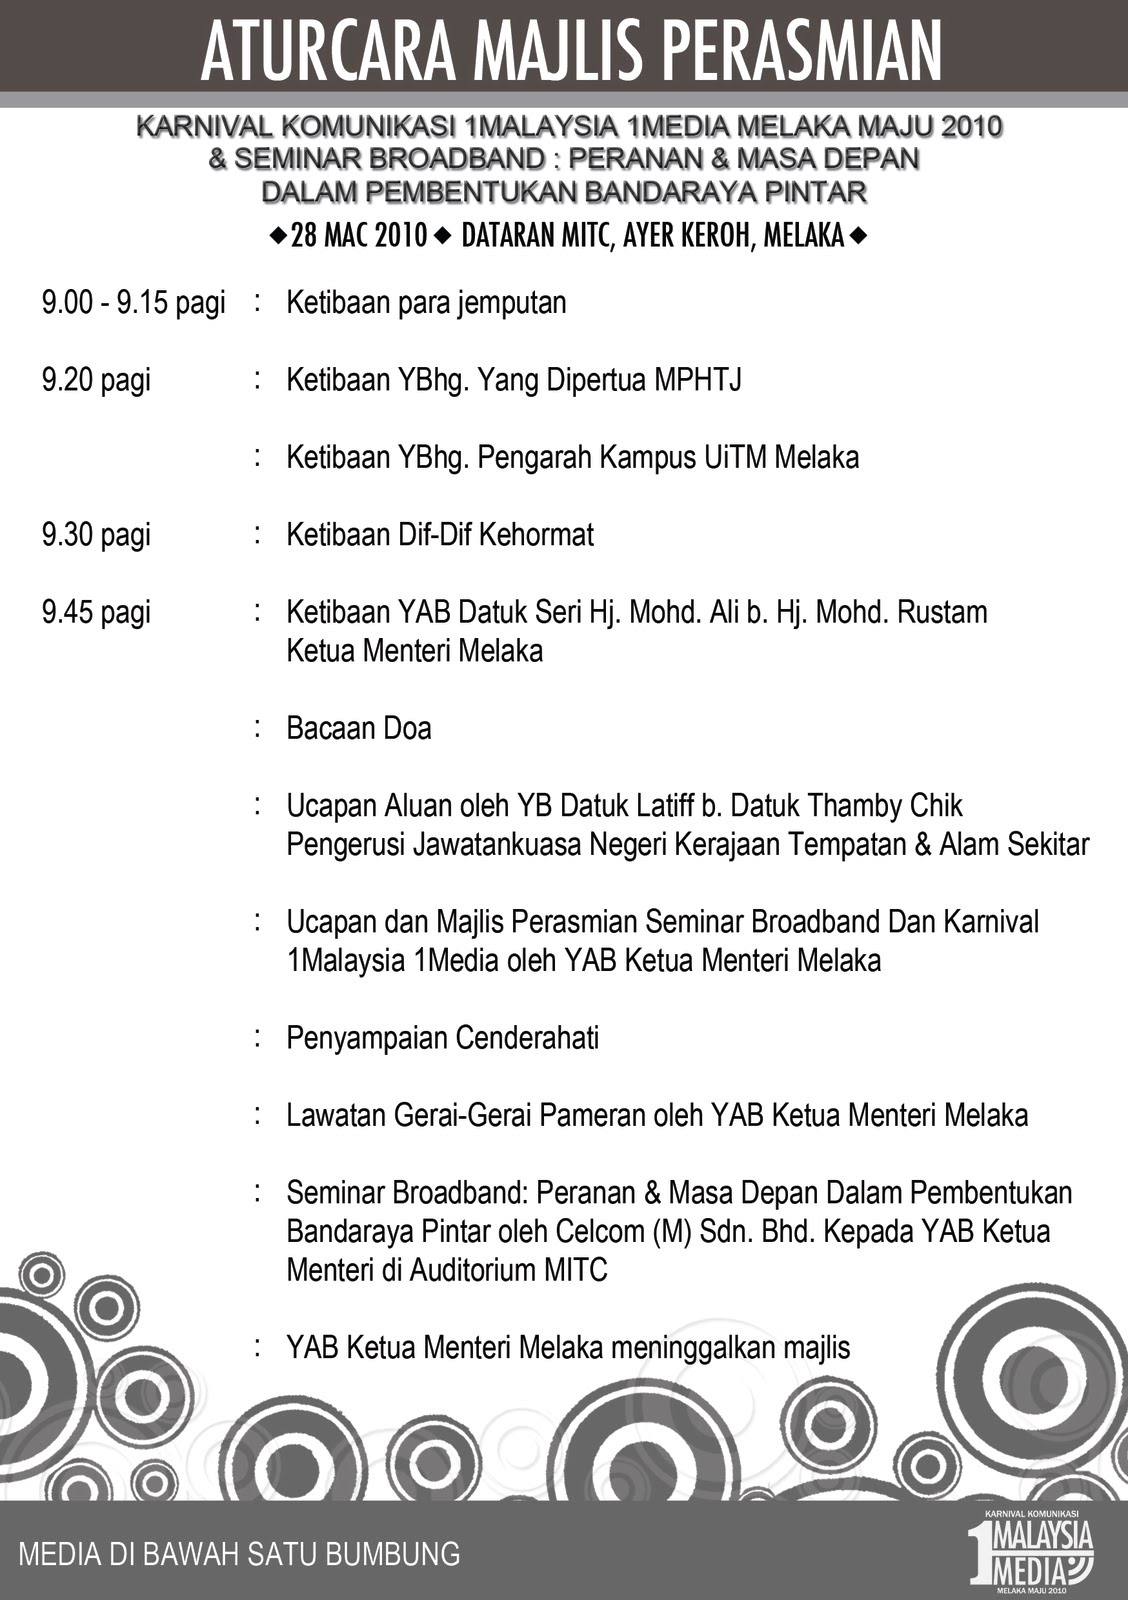 Atucara Majlis Perasmian Karnival 1 Malaysia 1 Media